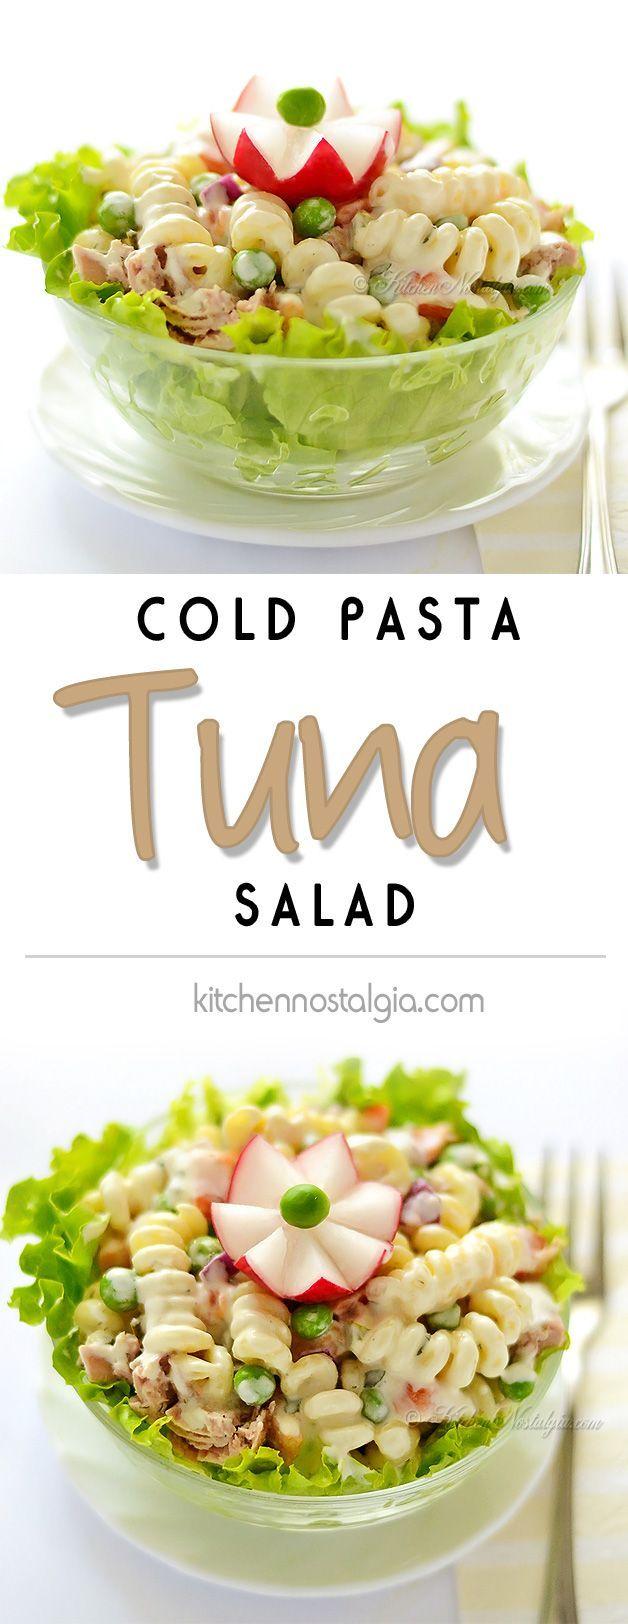 Cold Pasta Tuna Salad Recipe Nostalgia Picnics And Summer